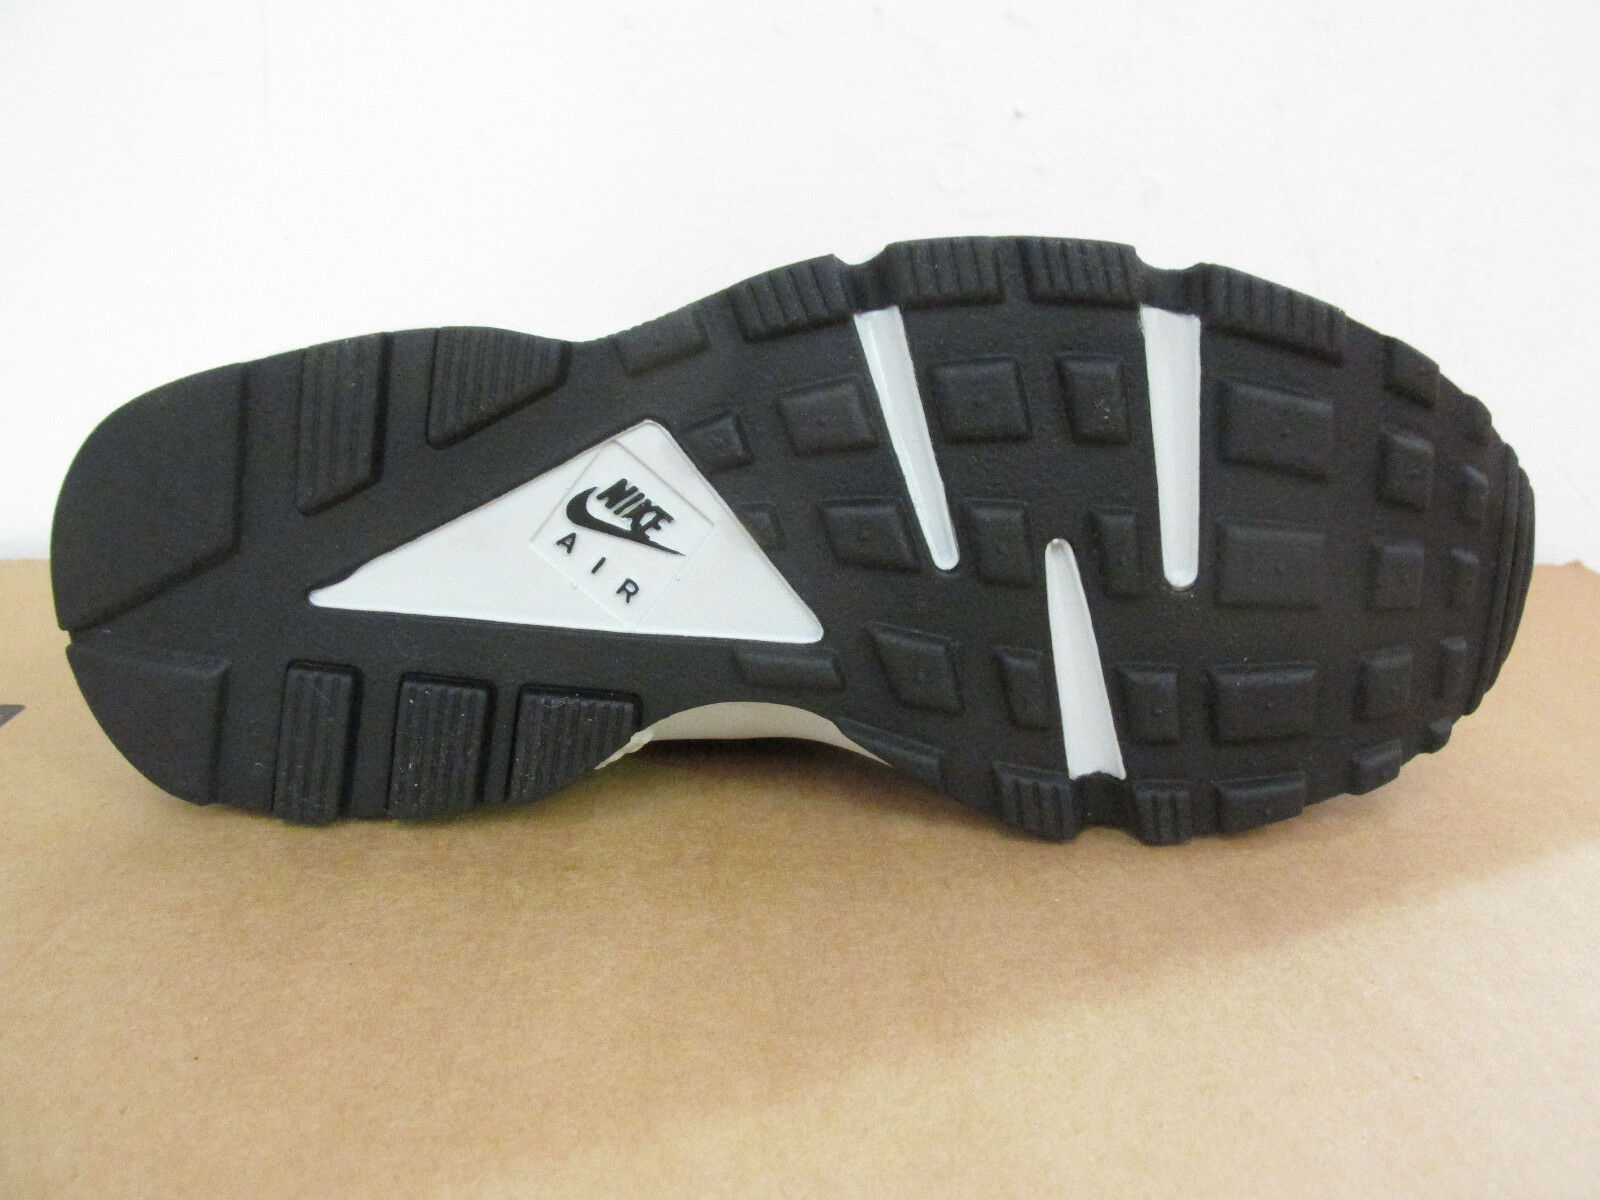 Nike laufen air huarache laufen Nike frauen laufen 634835 402 turnschuhe schuh - trainer 3784f7